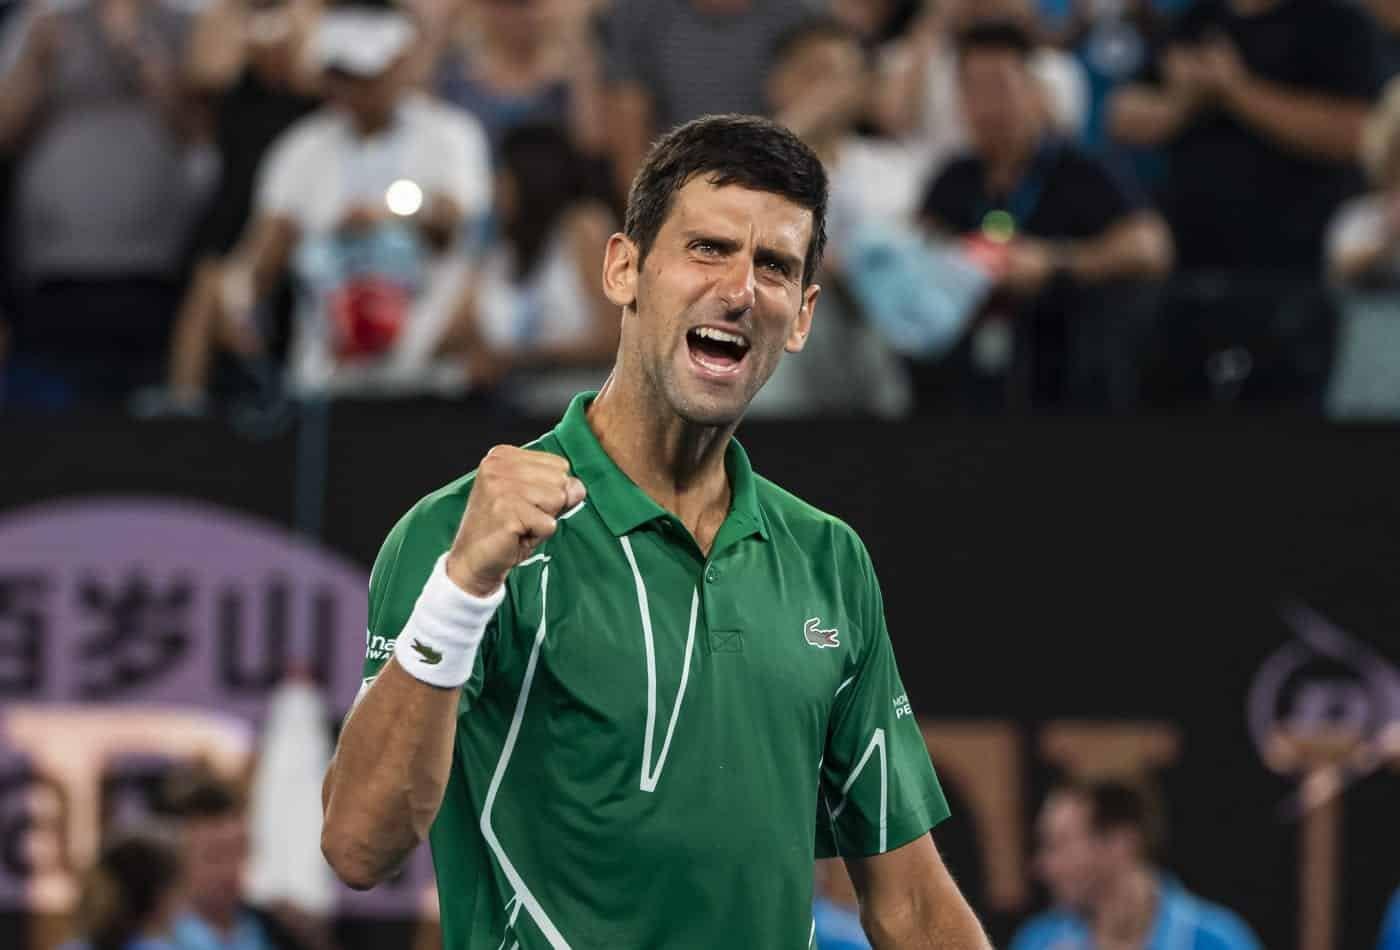 Novak Djokovic vegán étrend